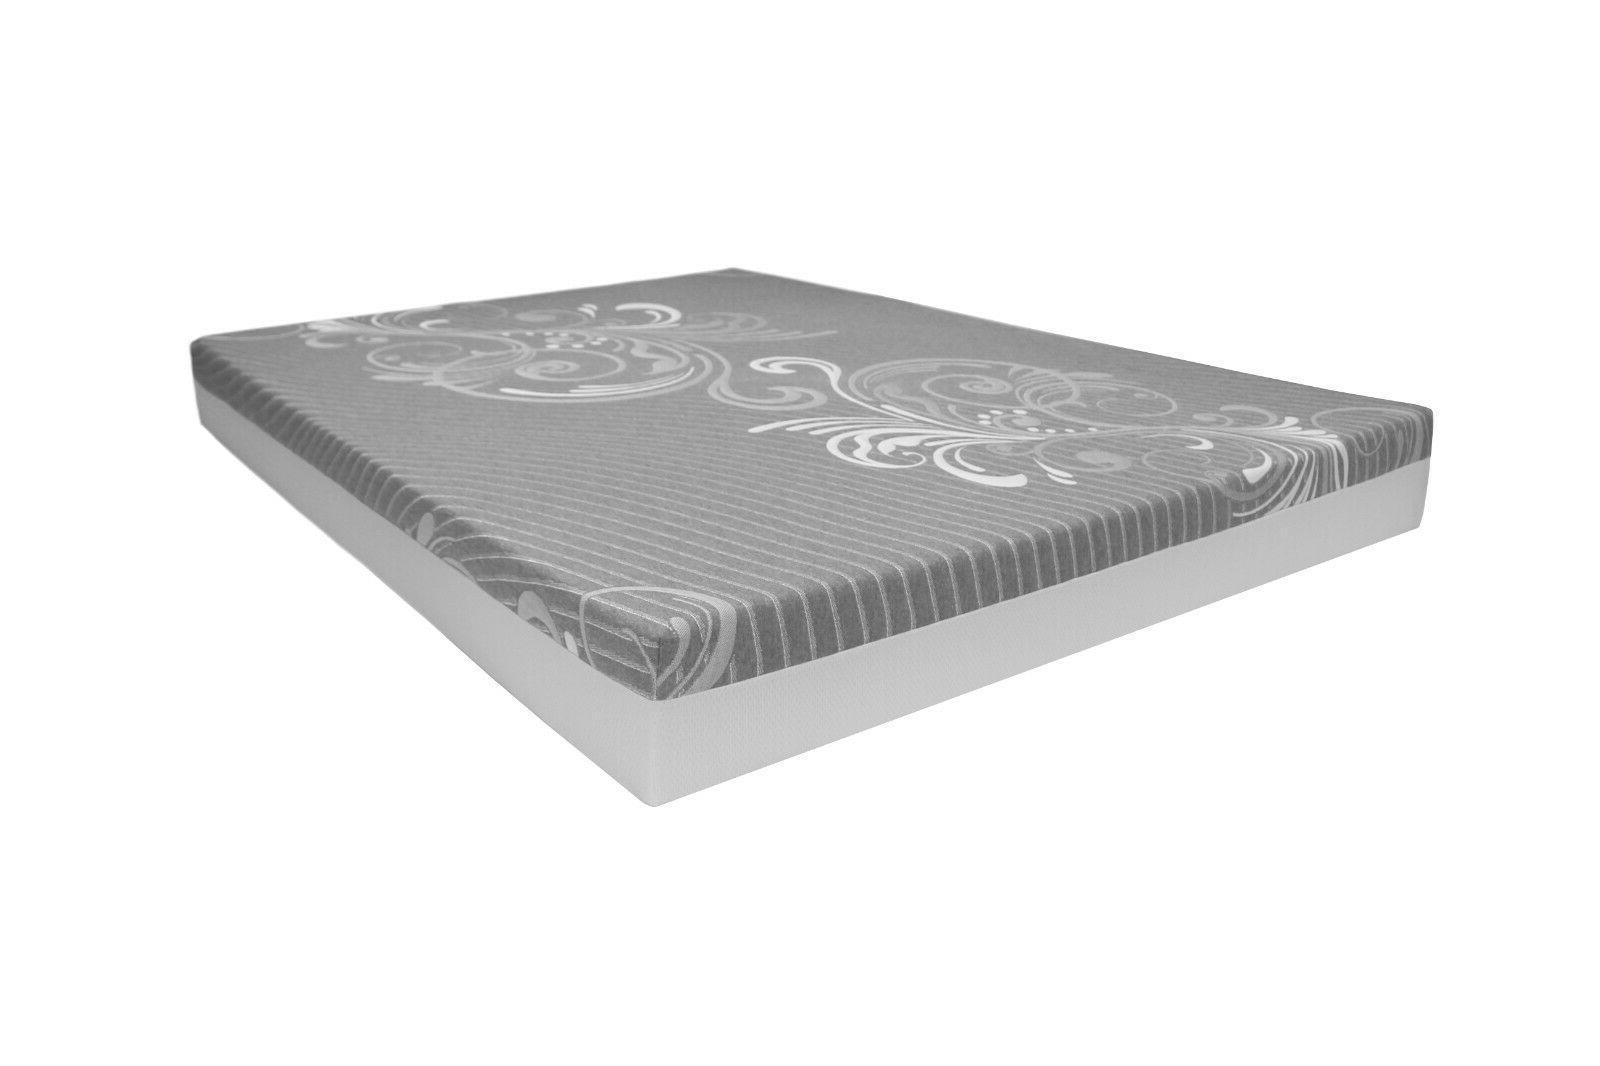 "LOUNJ 8"" Gel Foam Mattress King Queen Cal Full in USA"